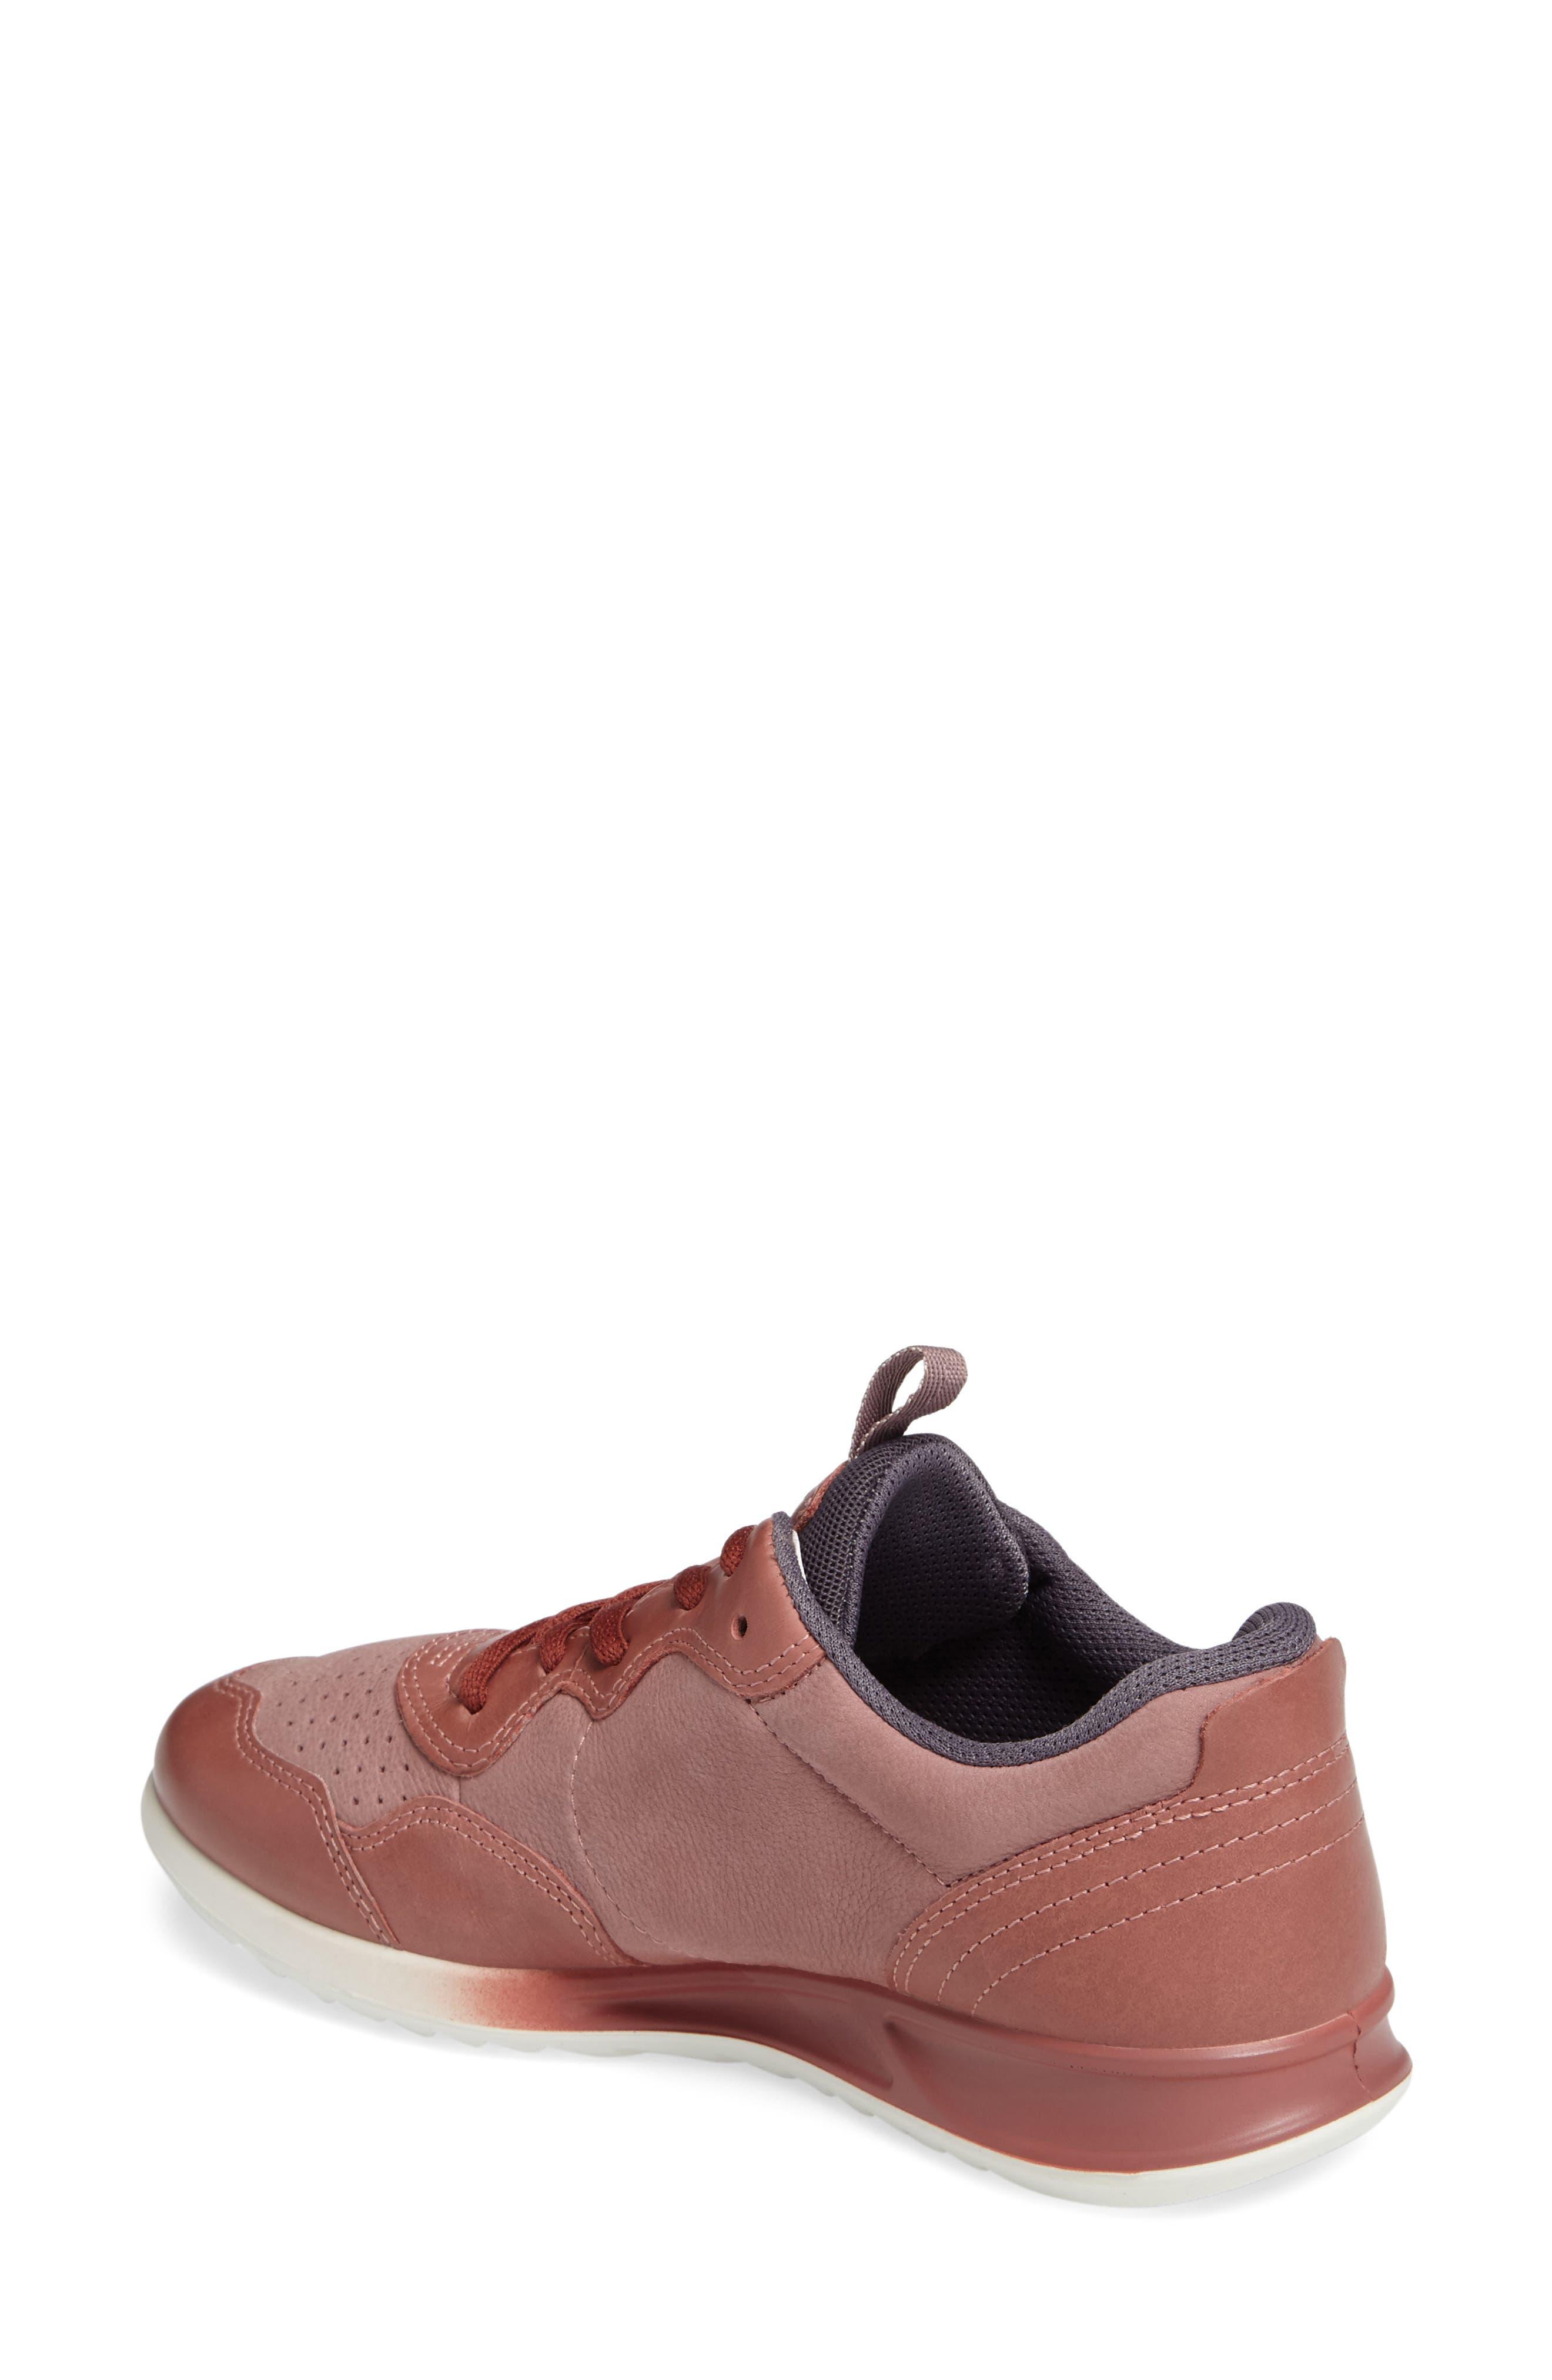 Genna Sneaker,                             Alternate thumbnail 8, color,